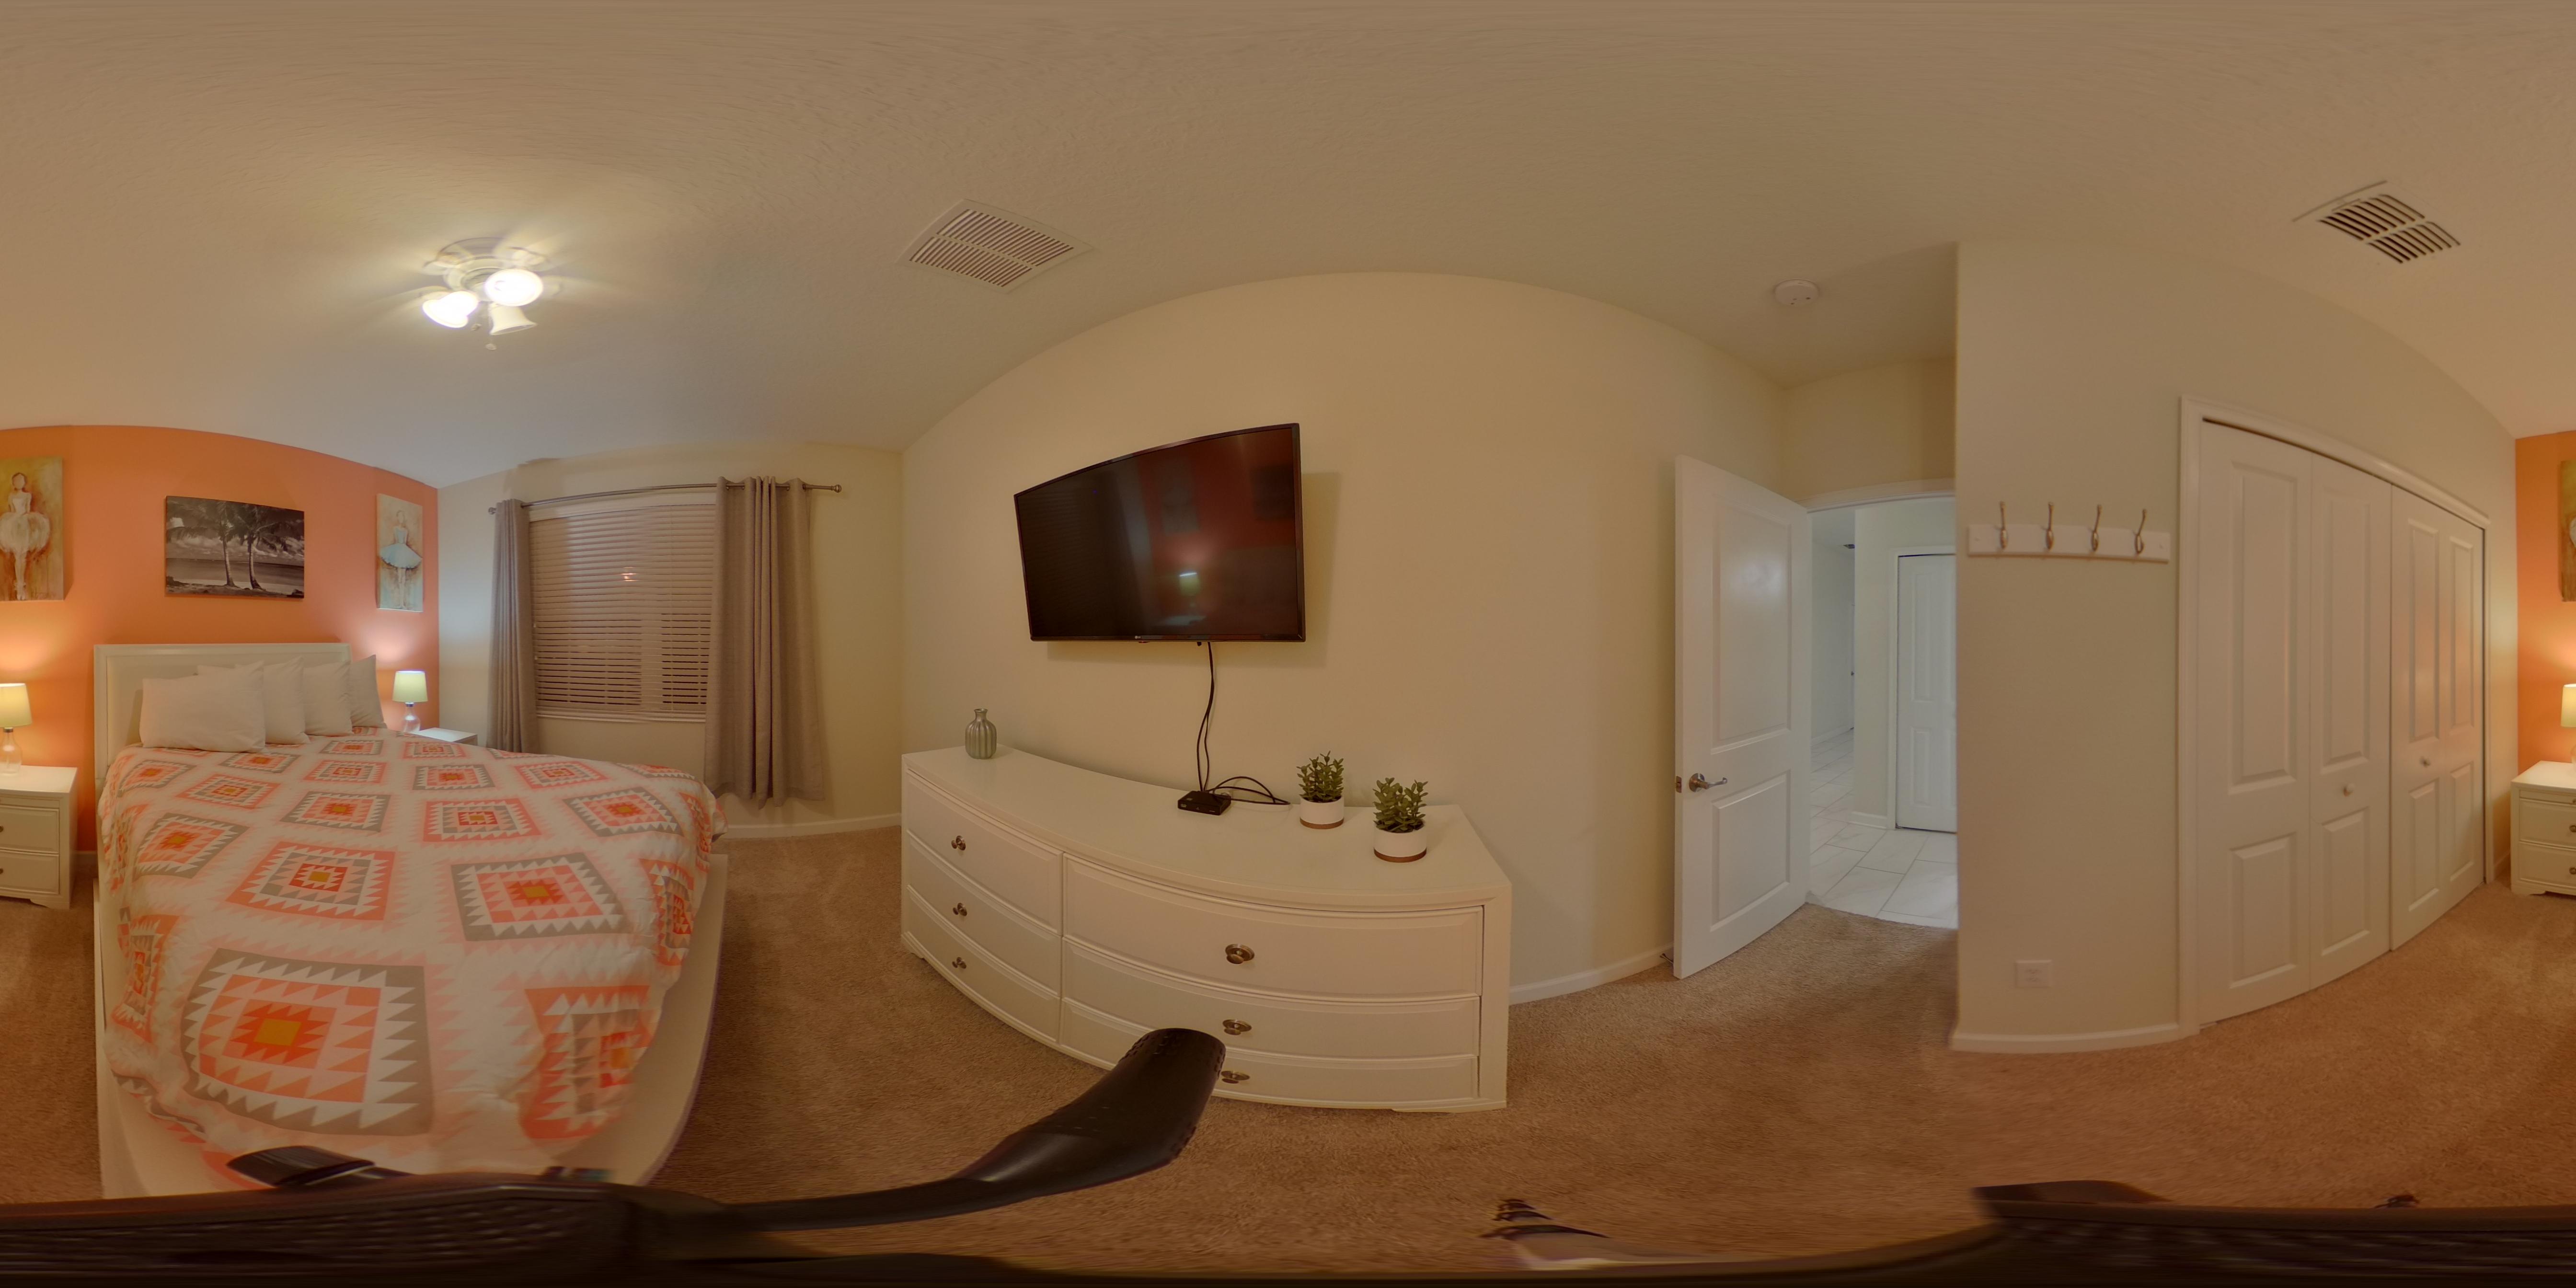 Apartment Villa  10 min from Disney  Golf  Wetpark all new photo 24719408